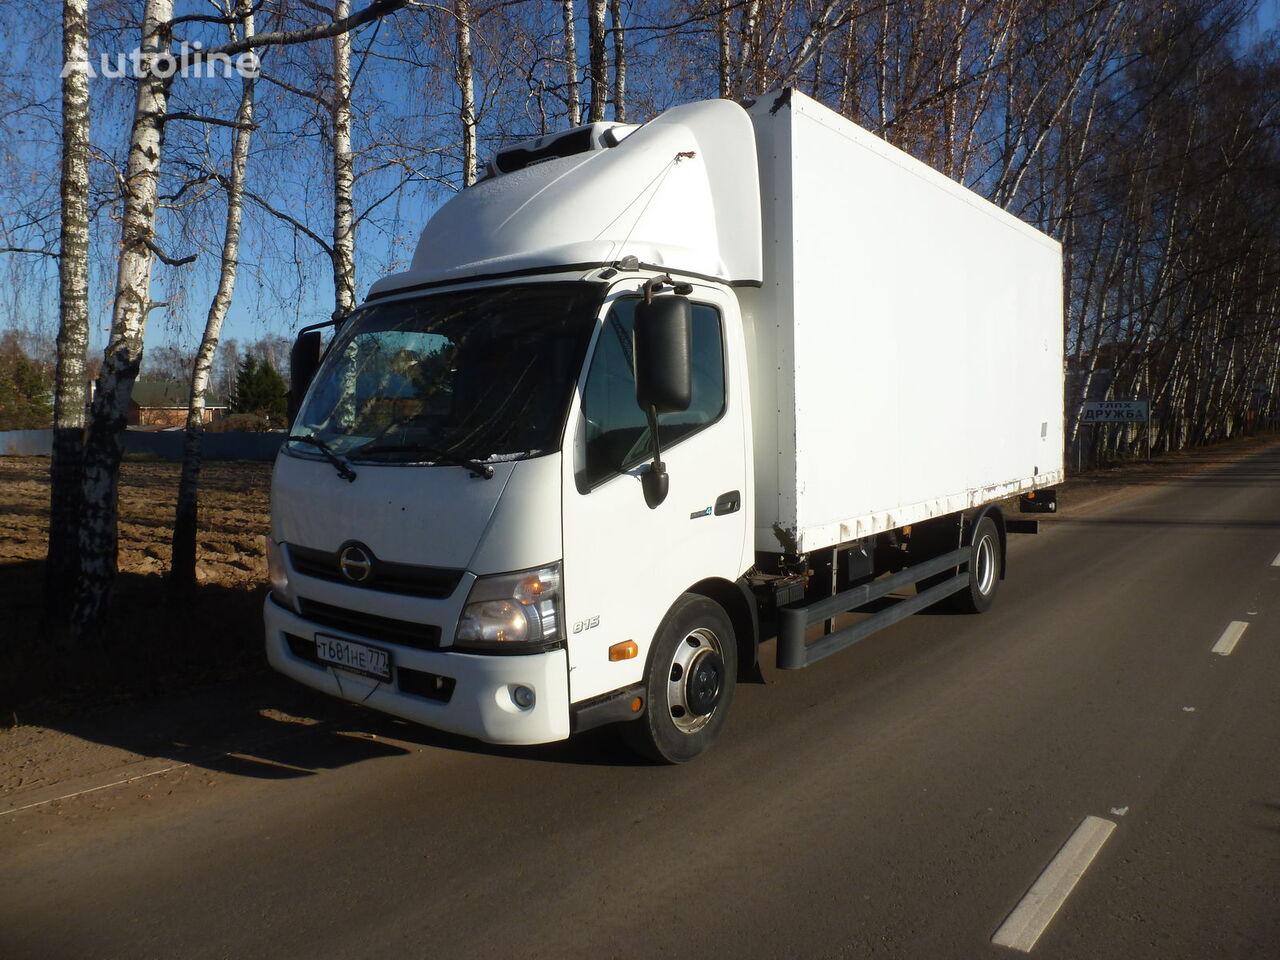 HINO Refrizherator 300 Gruzopodemnost 5 000 kg refrigerated truck